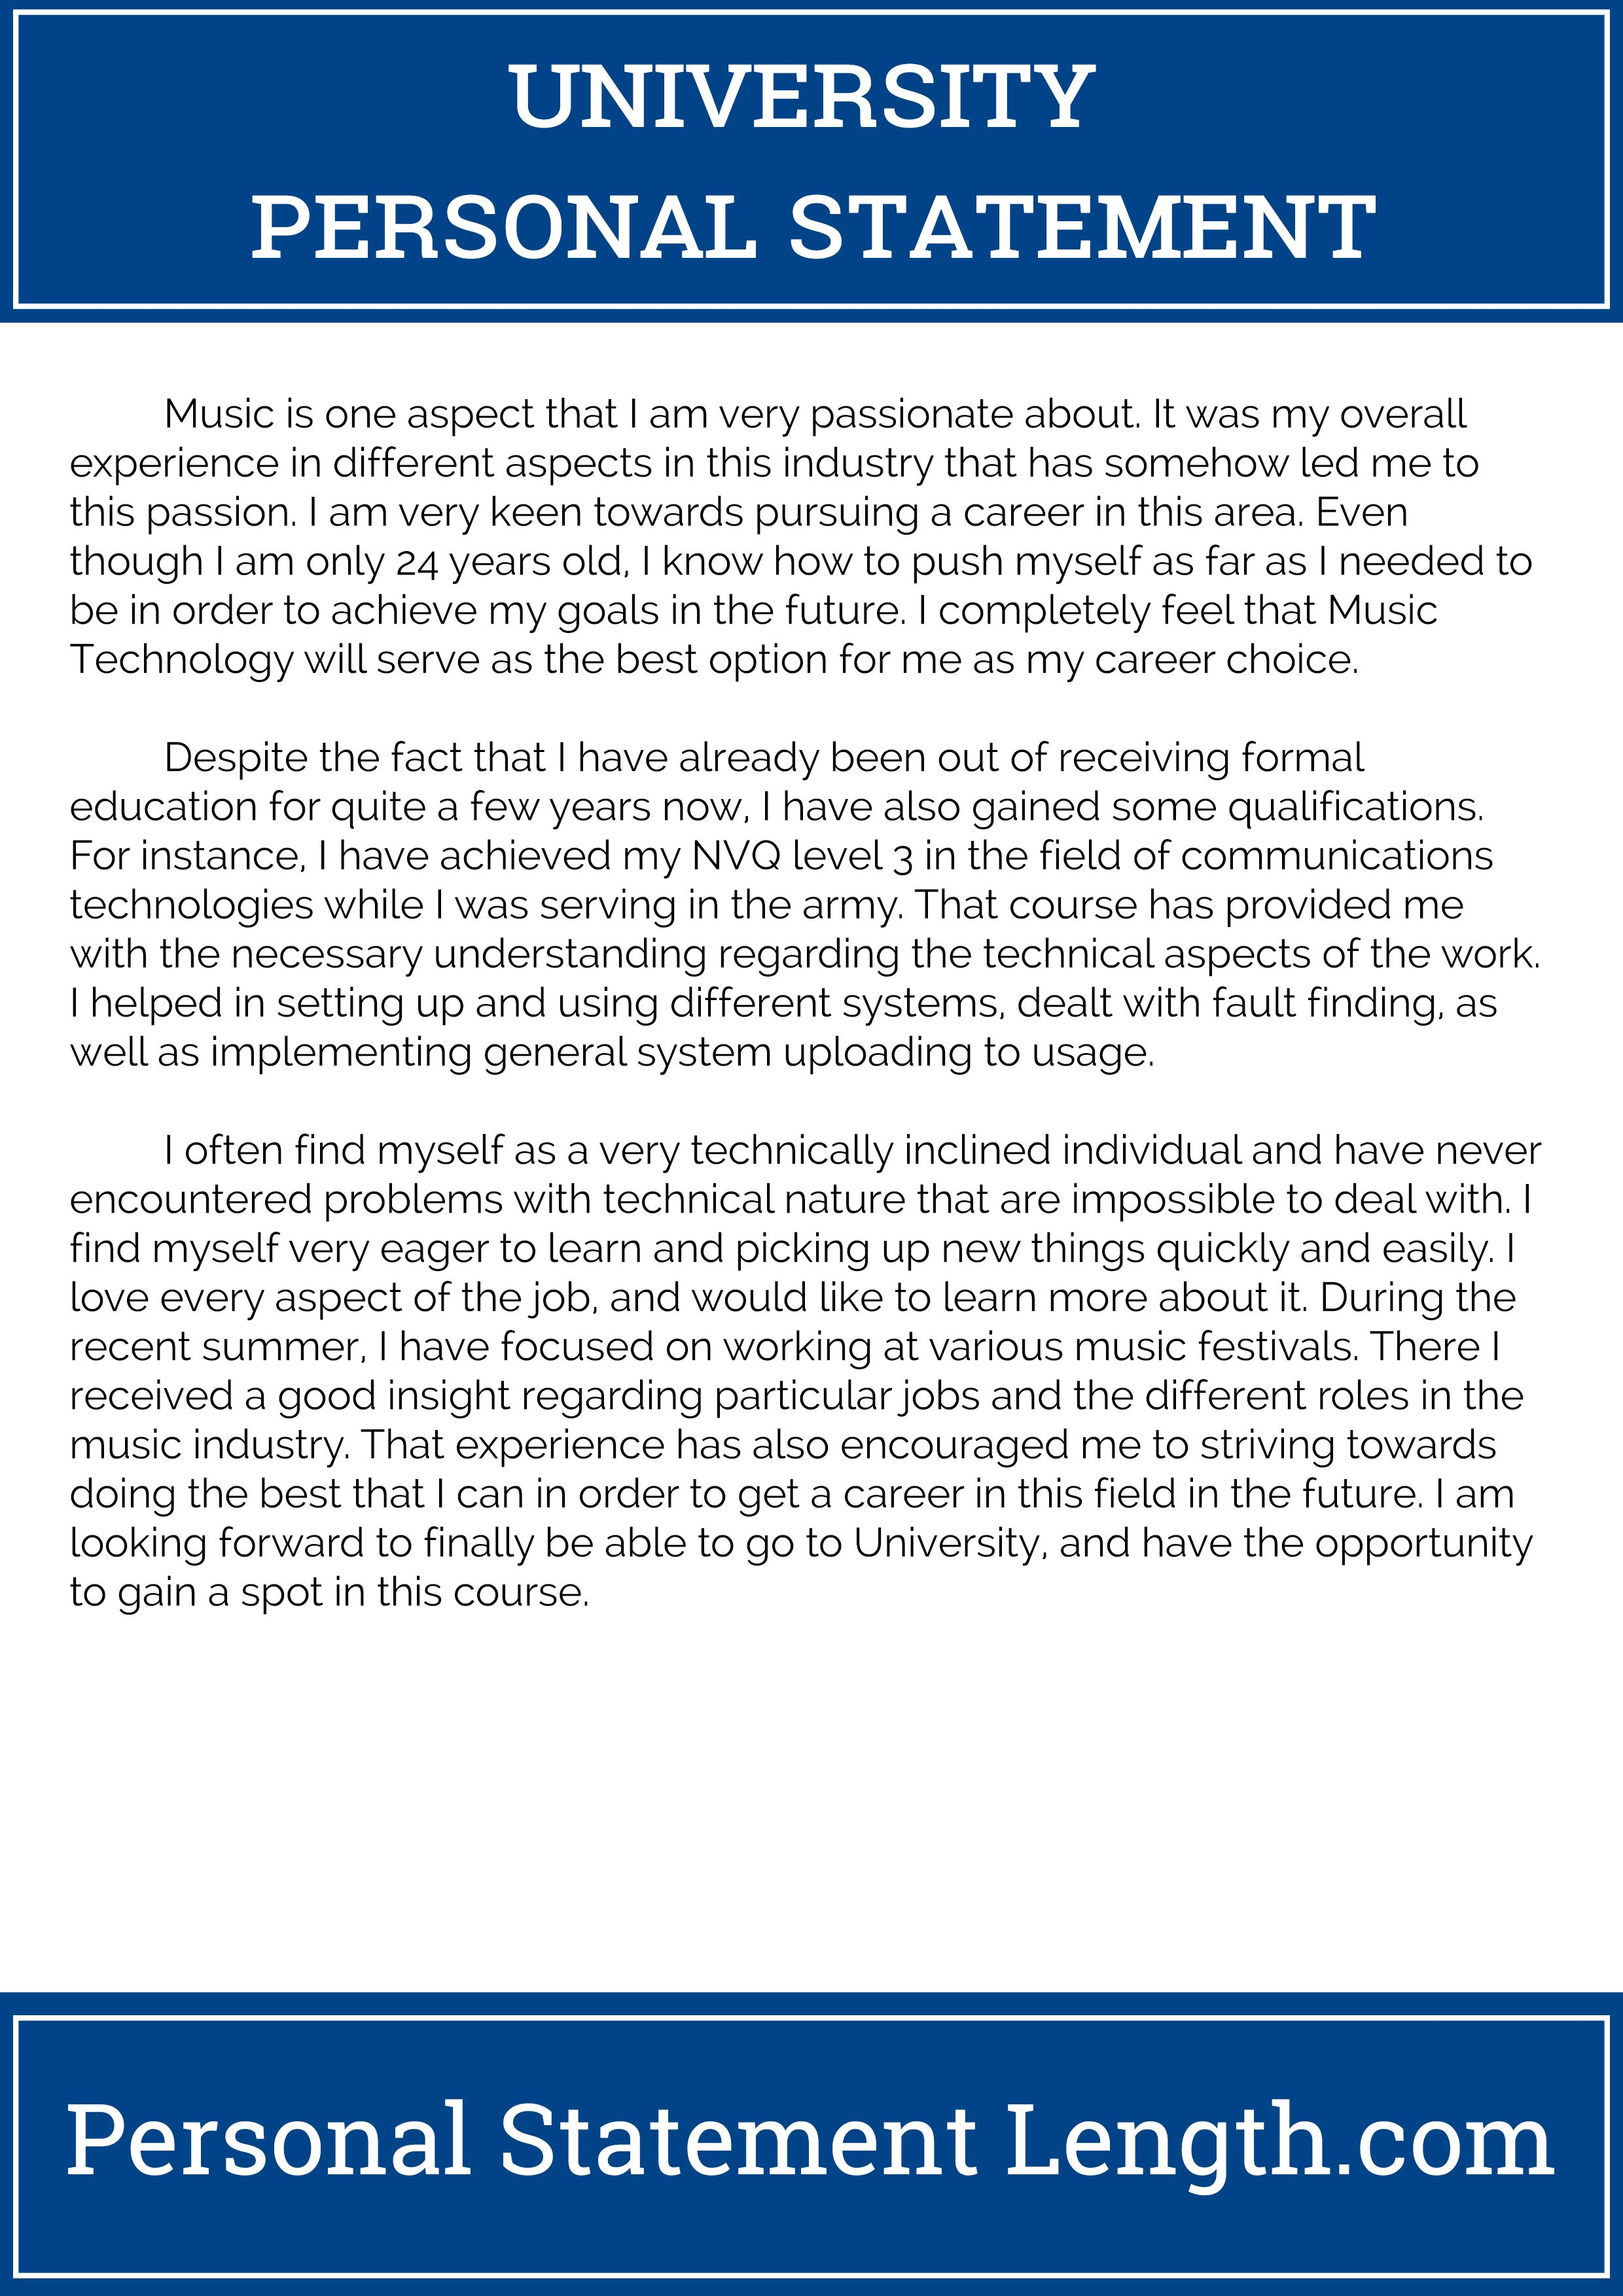 university personal statement template